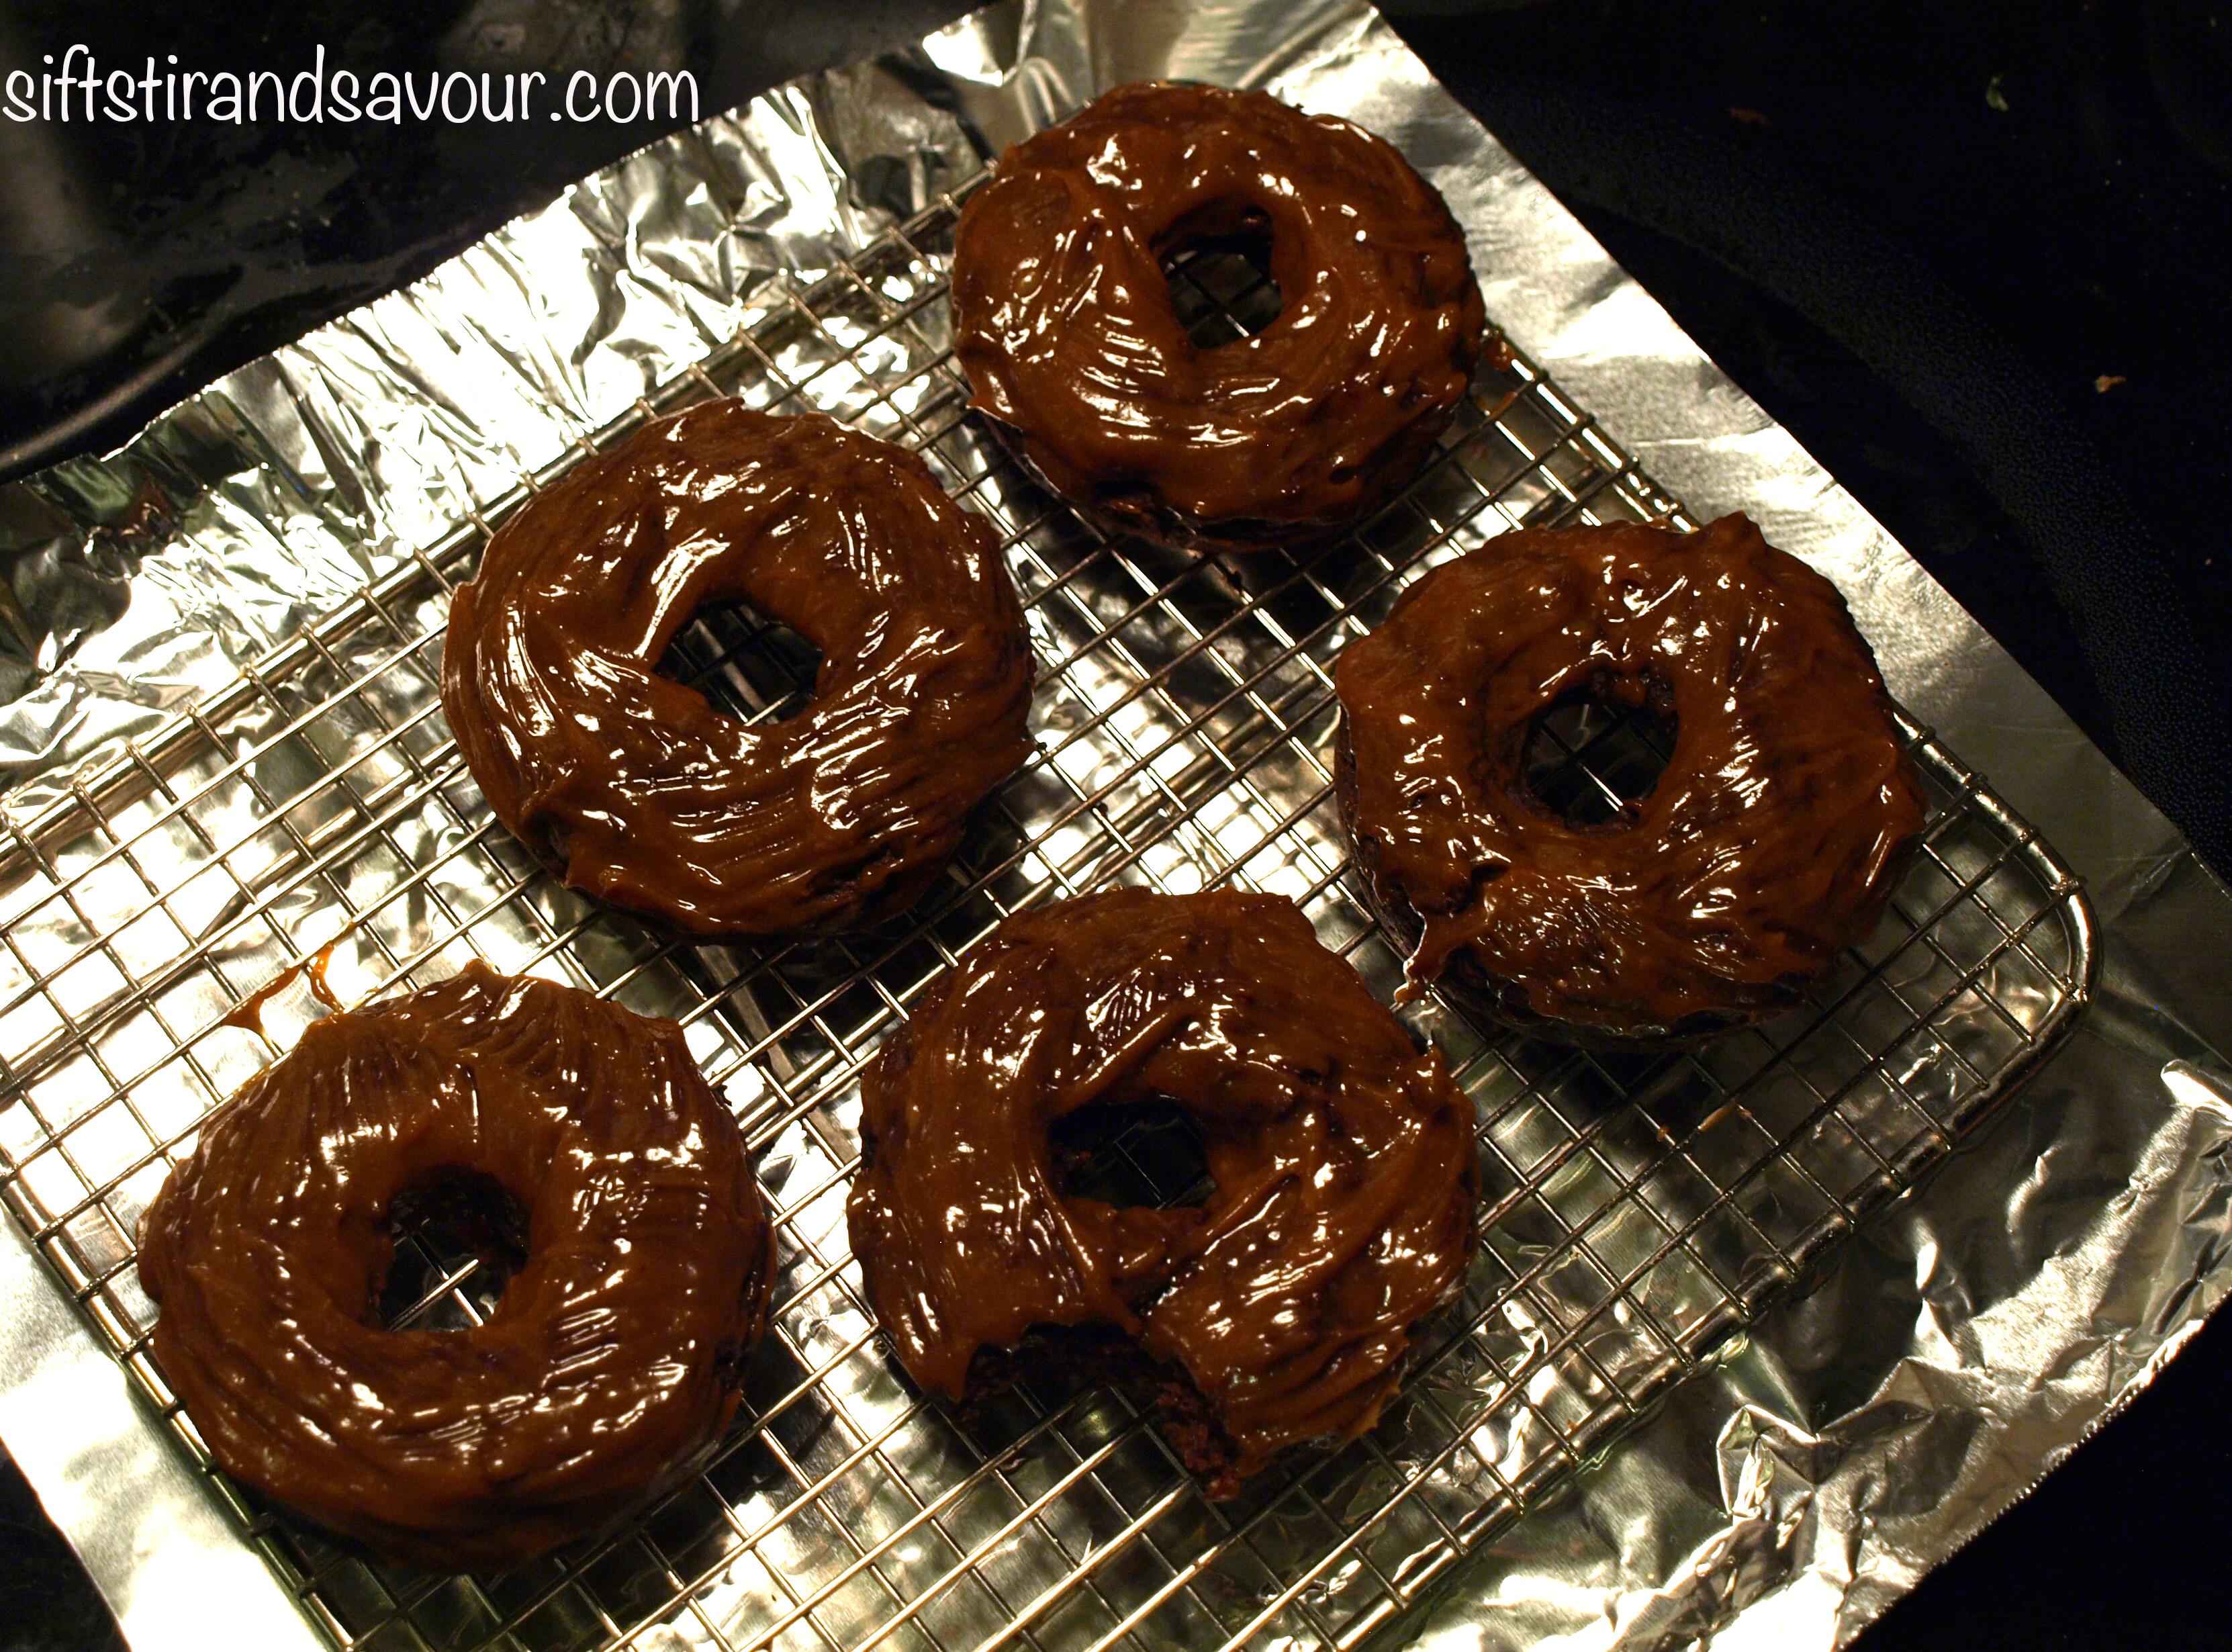 doughnuts that are gluten free doughnut bites gluten free donut holes ...